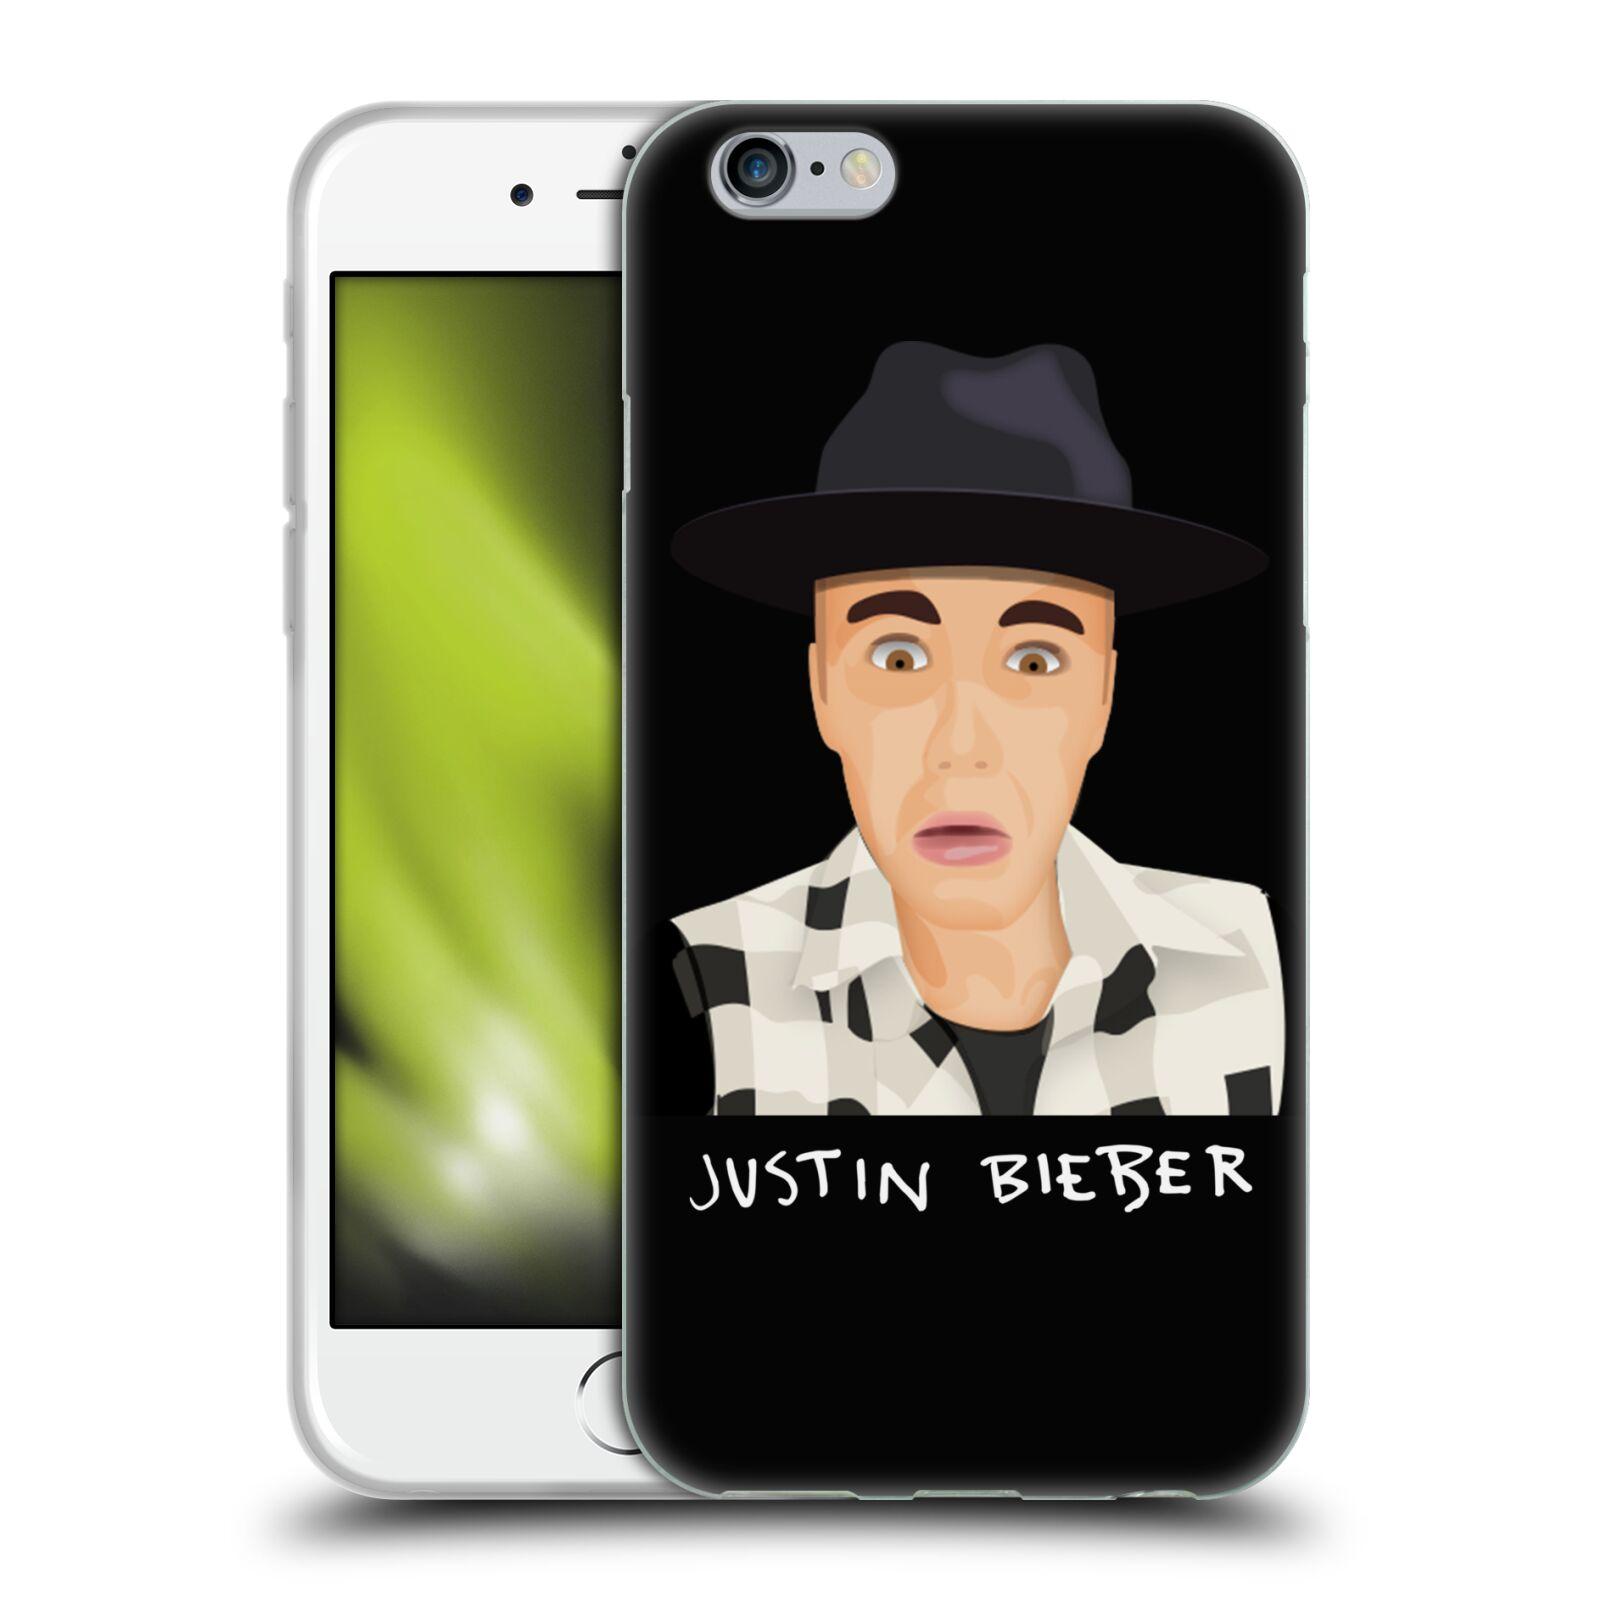 OFFICIAL-JUSTIN-BIEBER-JUSTMOJIS-SOFT-GEL-CASE-FOR-APPLE-iPHONE-PHONES